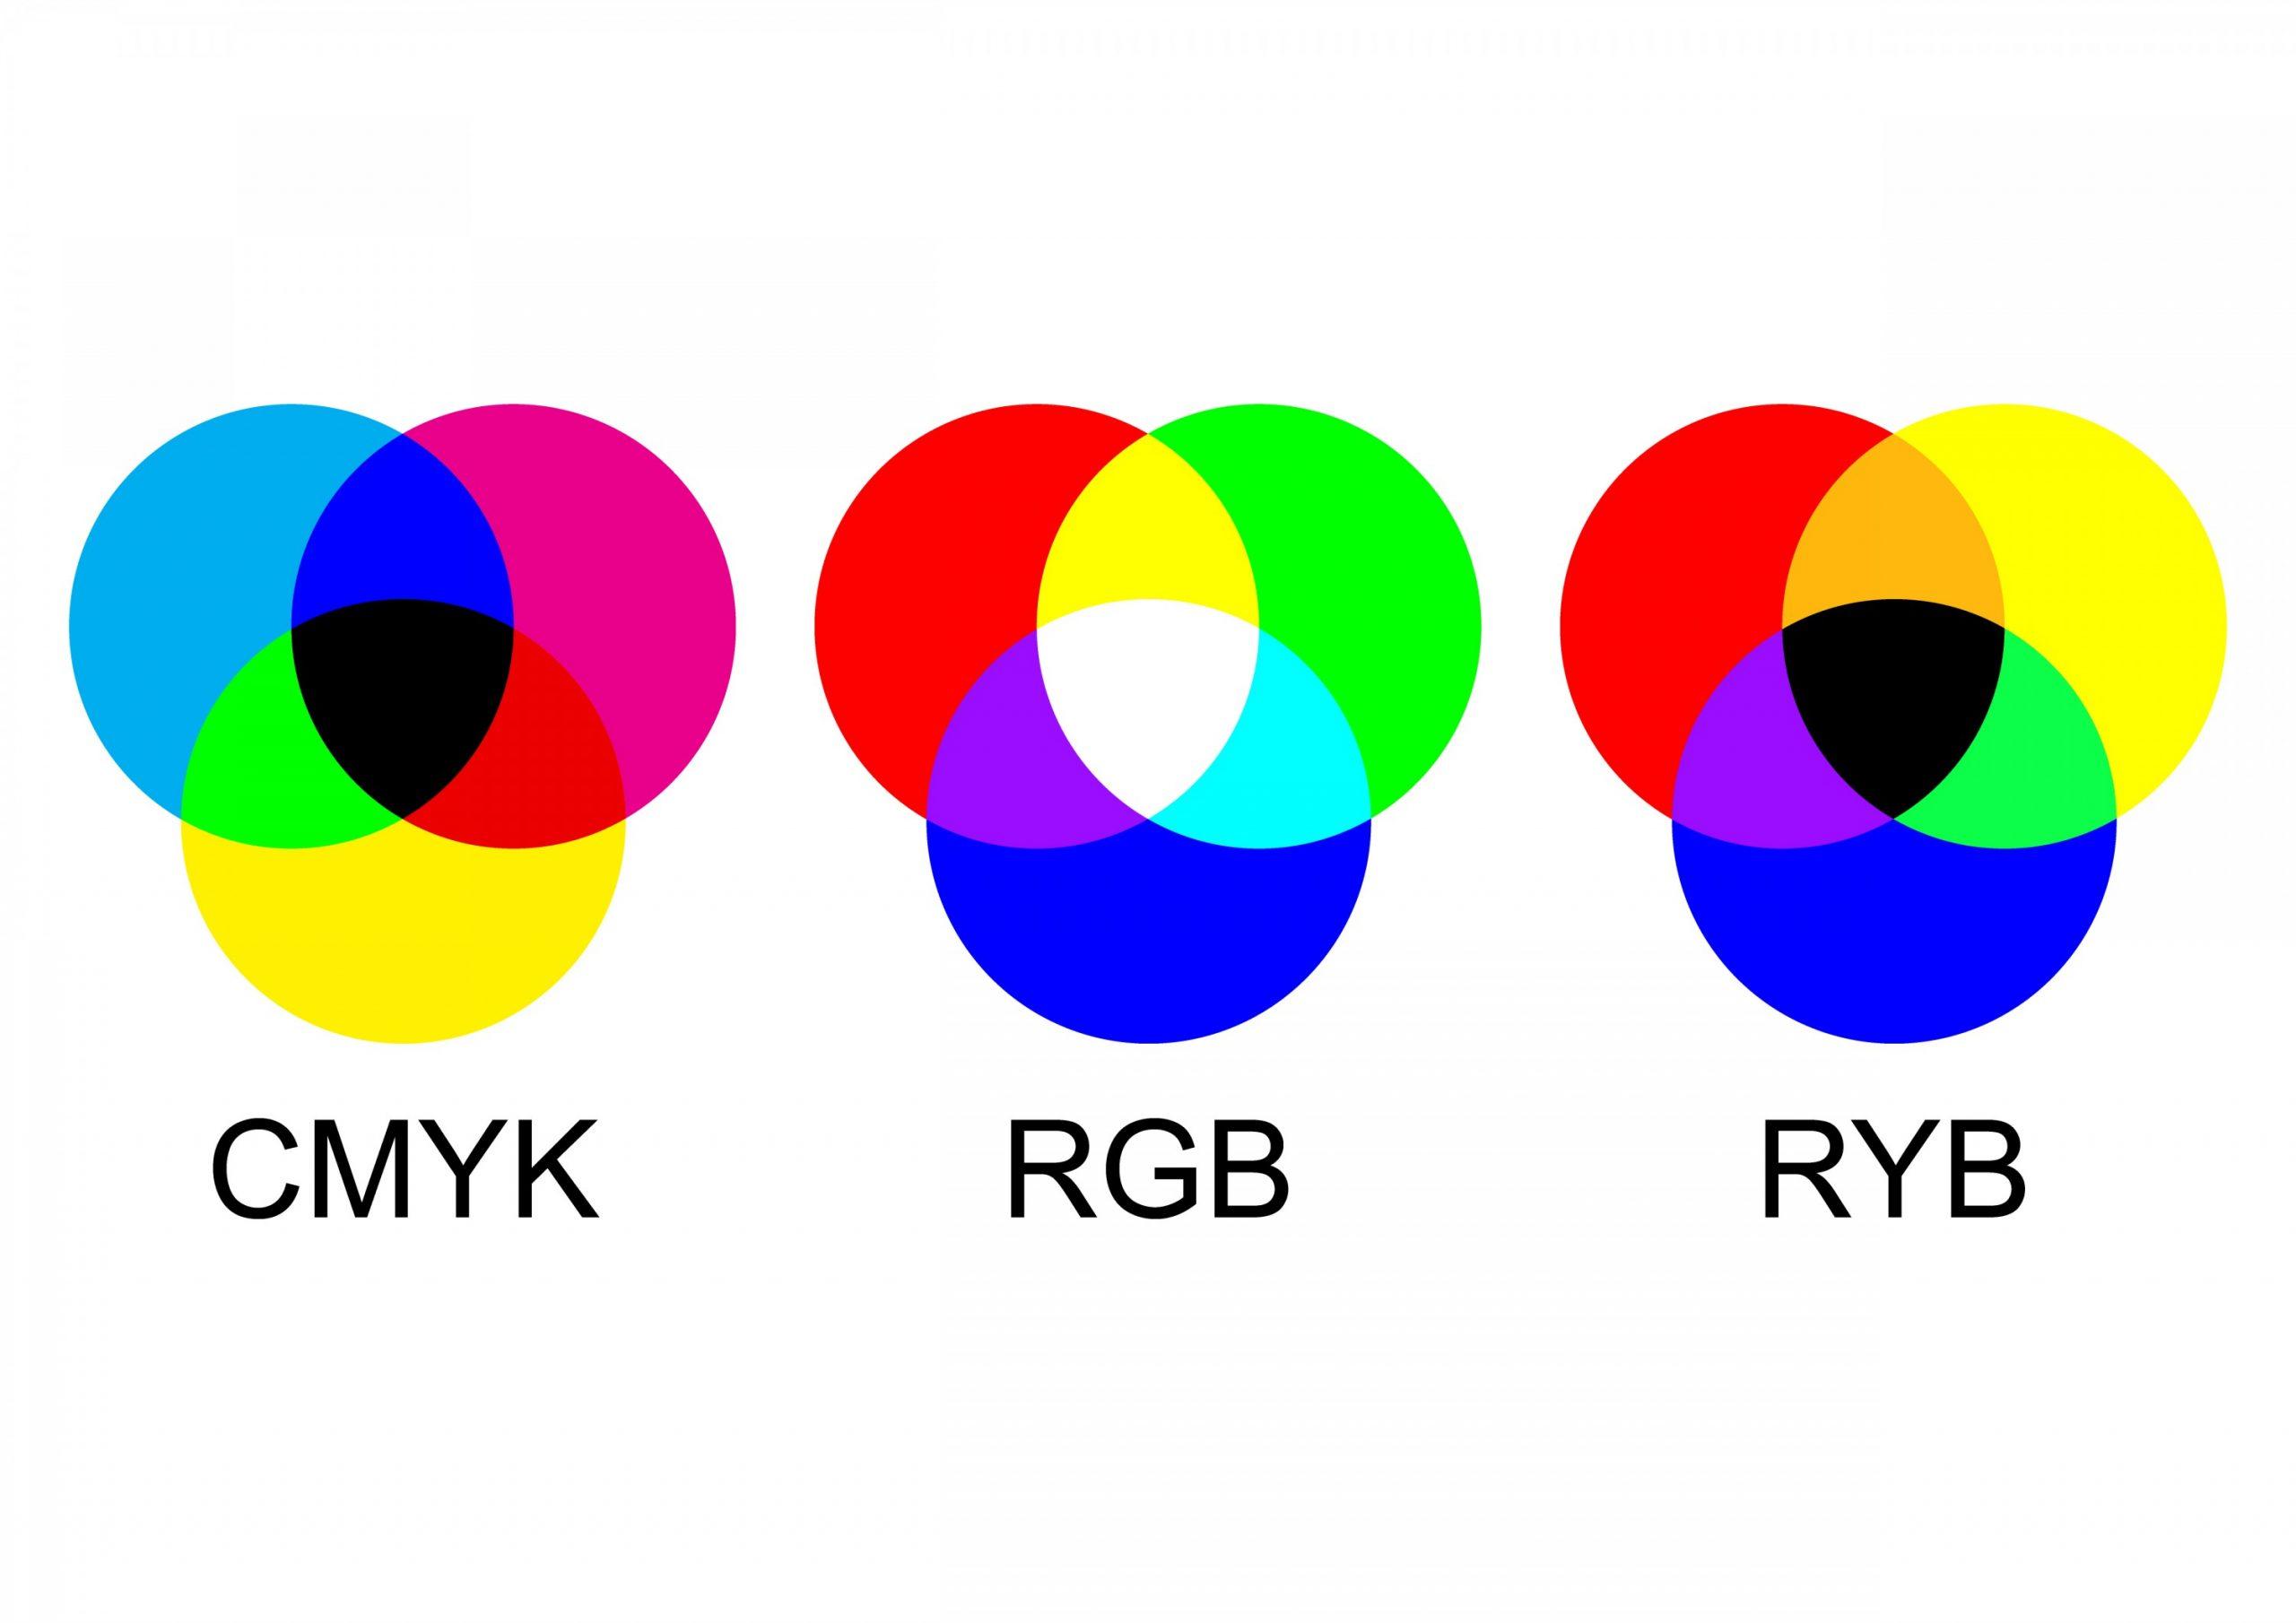 sistema de cores rgb, cmyk e ryb